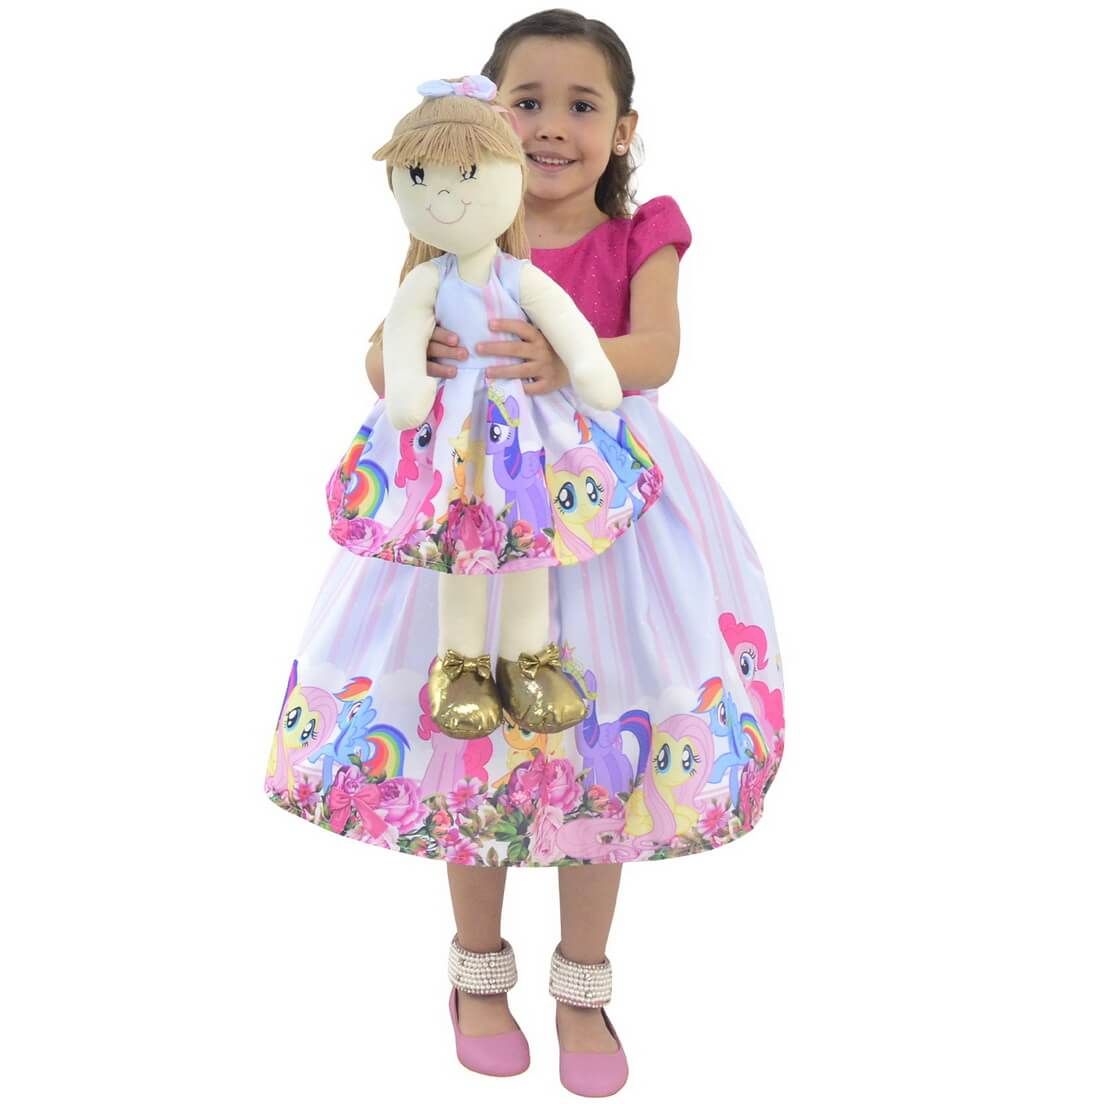 Tal Filha Tal Boneca Pri - Vestido My Little Pony Luxo